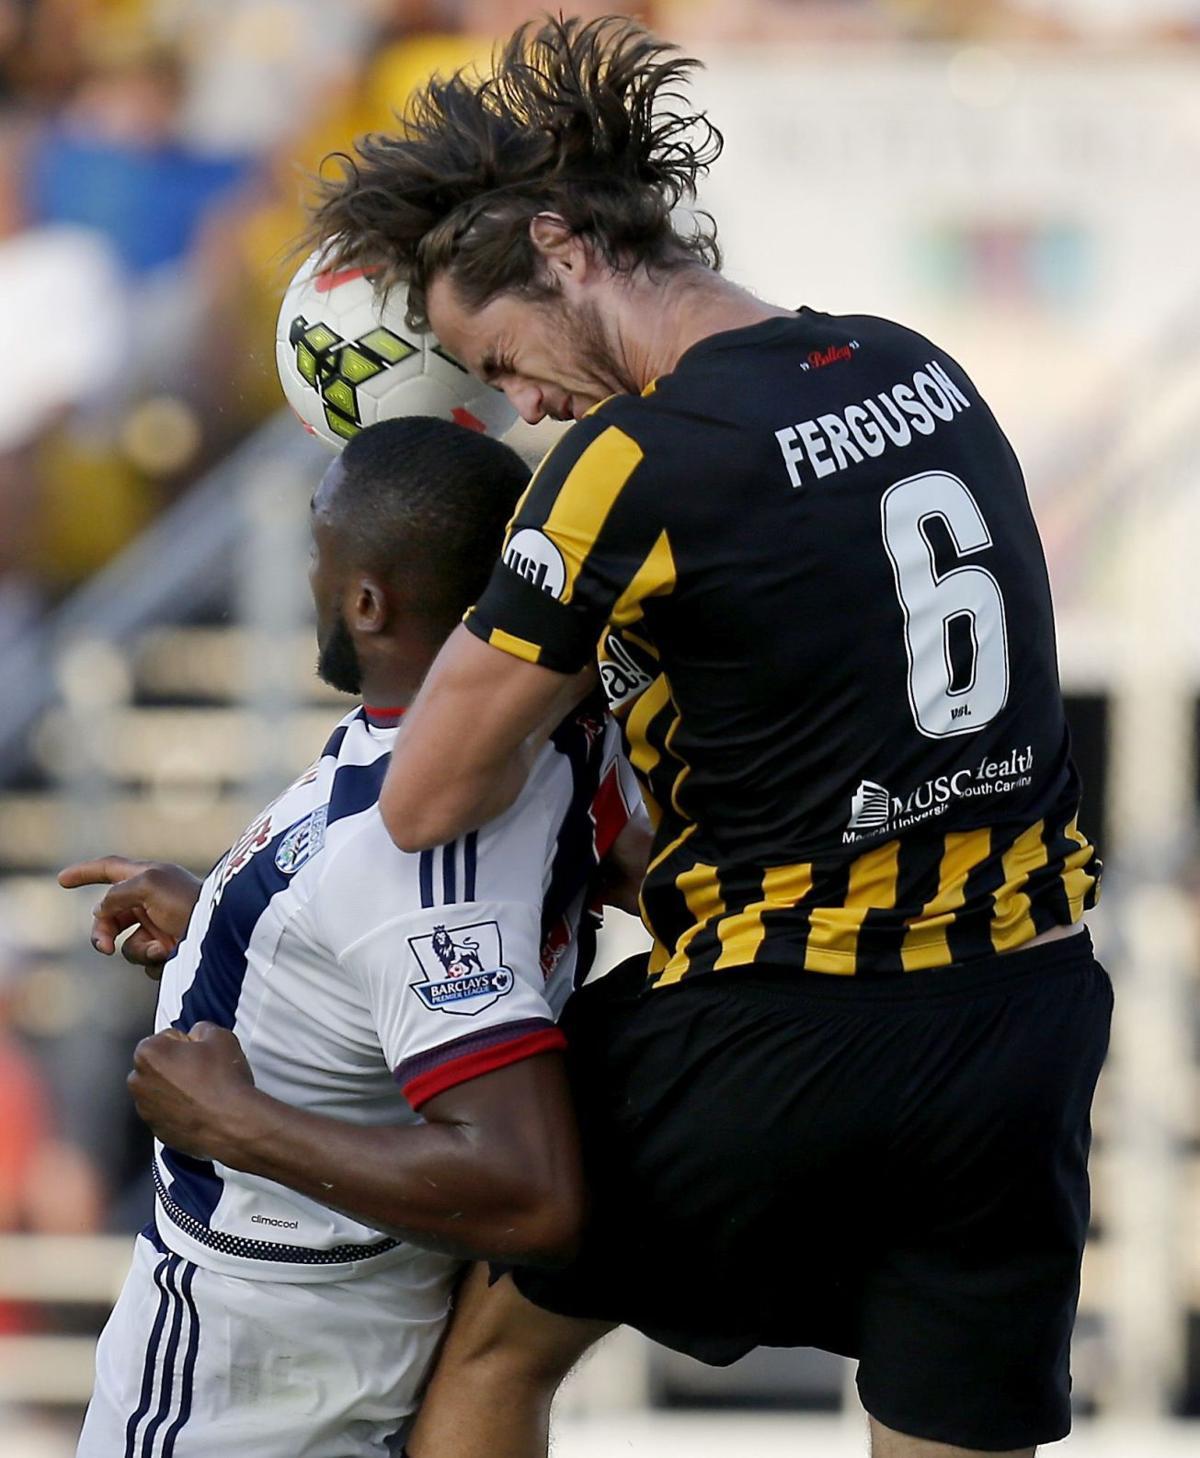 Charleston defender Shawn Ferguson making his mark with Battery